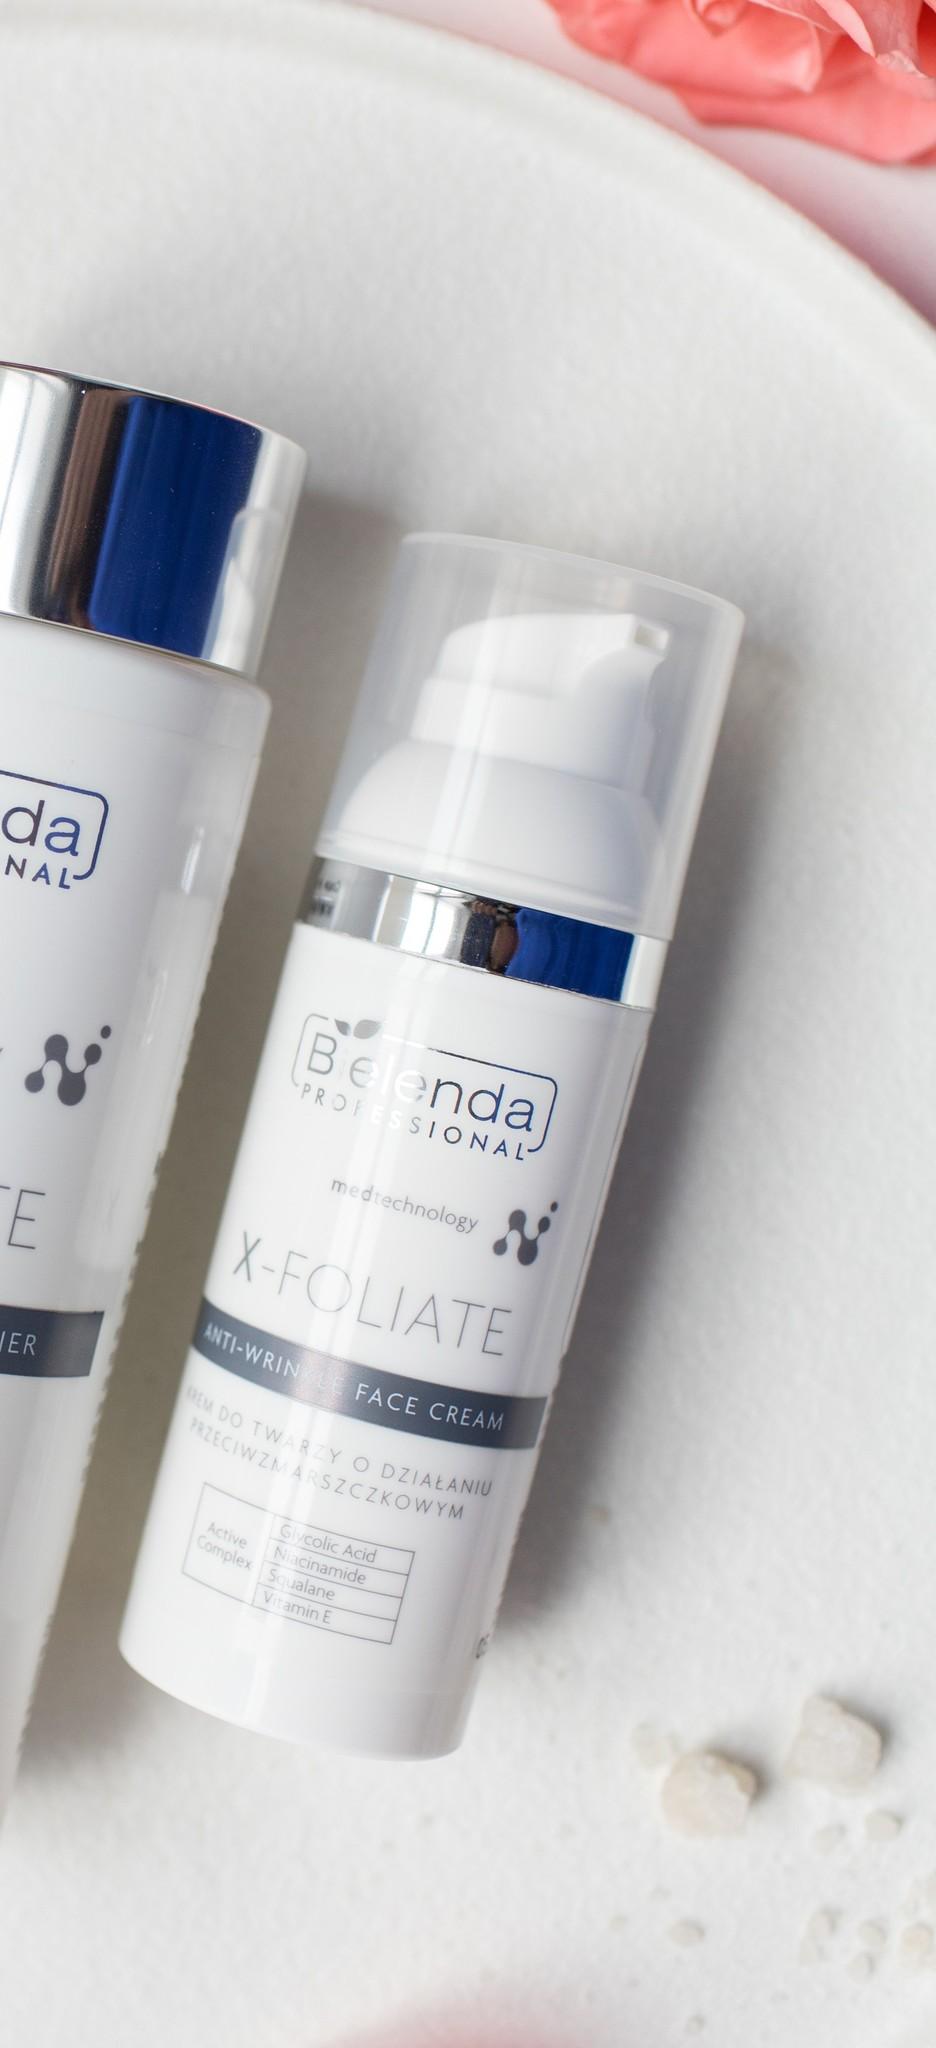 X-FOLIATE Anti Wrinkle Крем для лица с кислотами с мощным лифтинг эффектом, 50 мл.